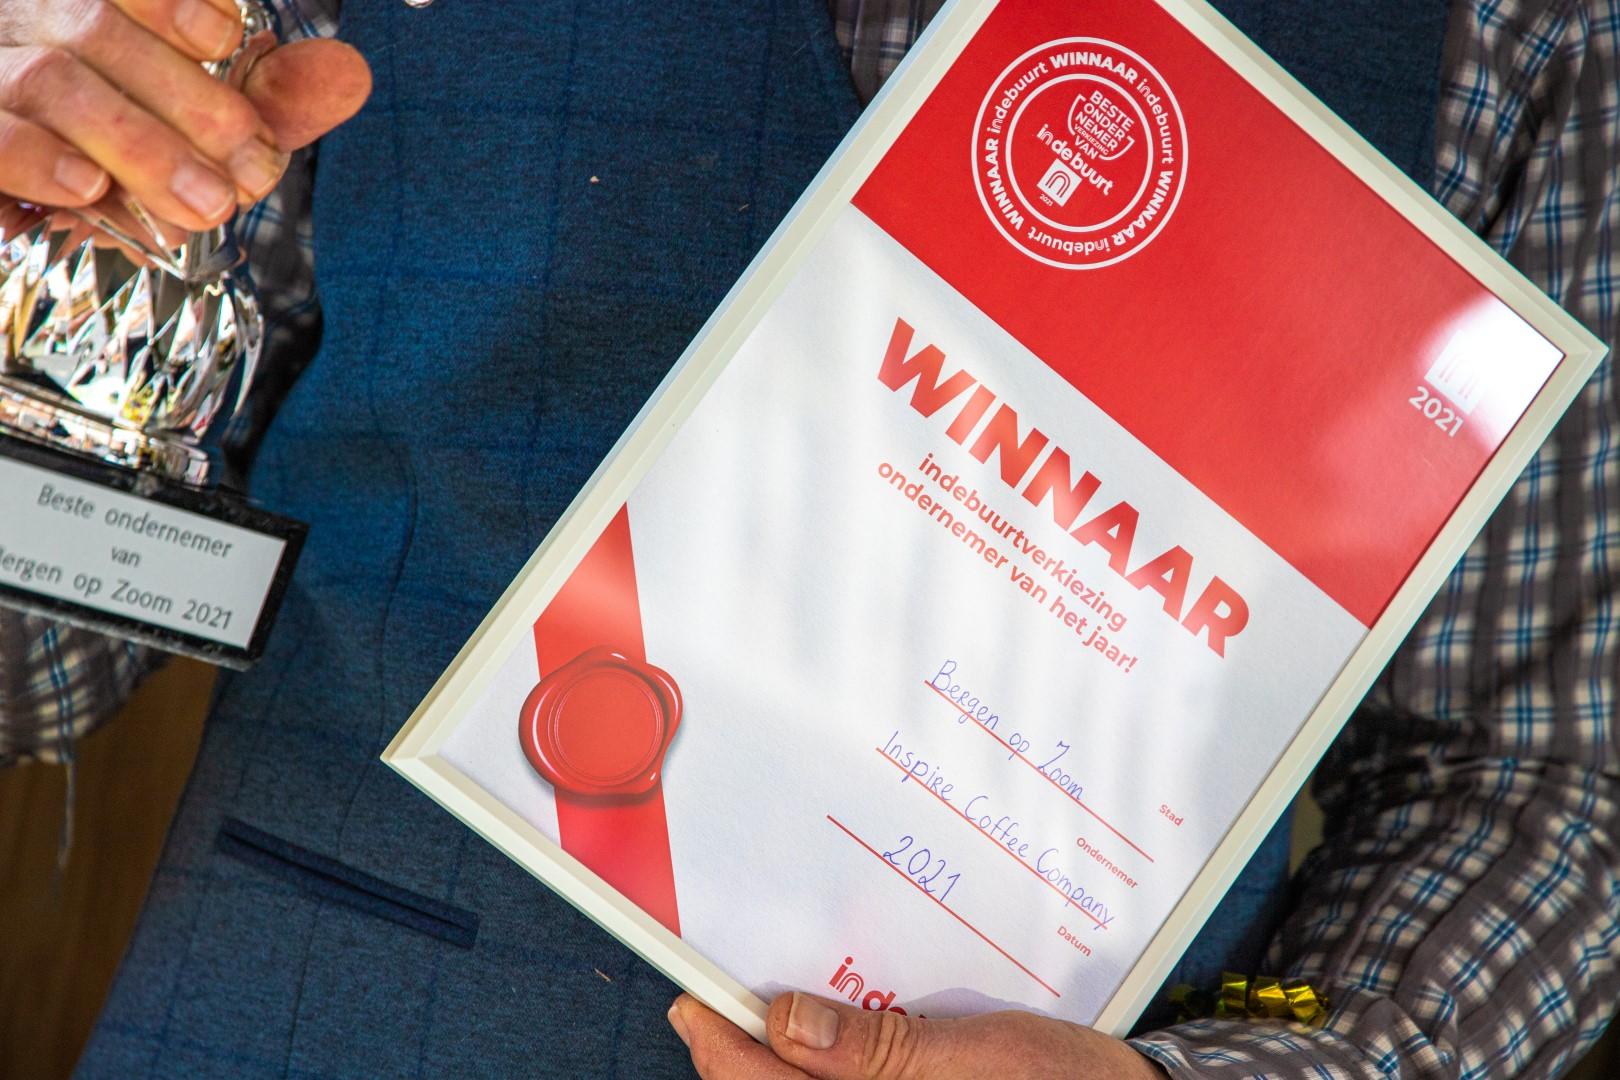 inspire coffee company winnaar indebuurt verkiezing ondernemer van het jaar 2021